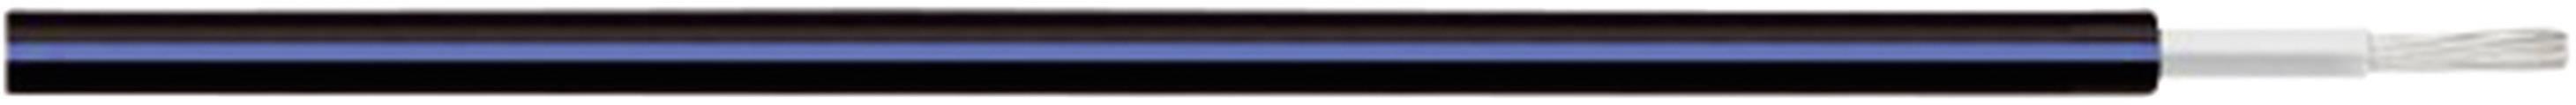 Fotovoltaický kabel ÖLFLEX® SOLAR XLR-R 1 x 4 mm² černá, červená LAPP 0023391 1000 m